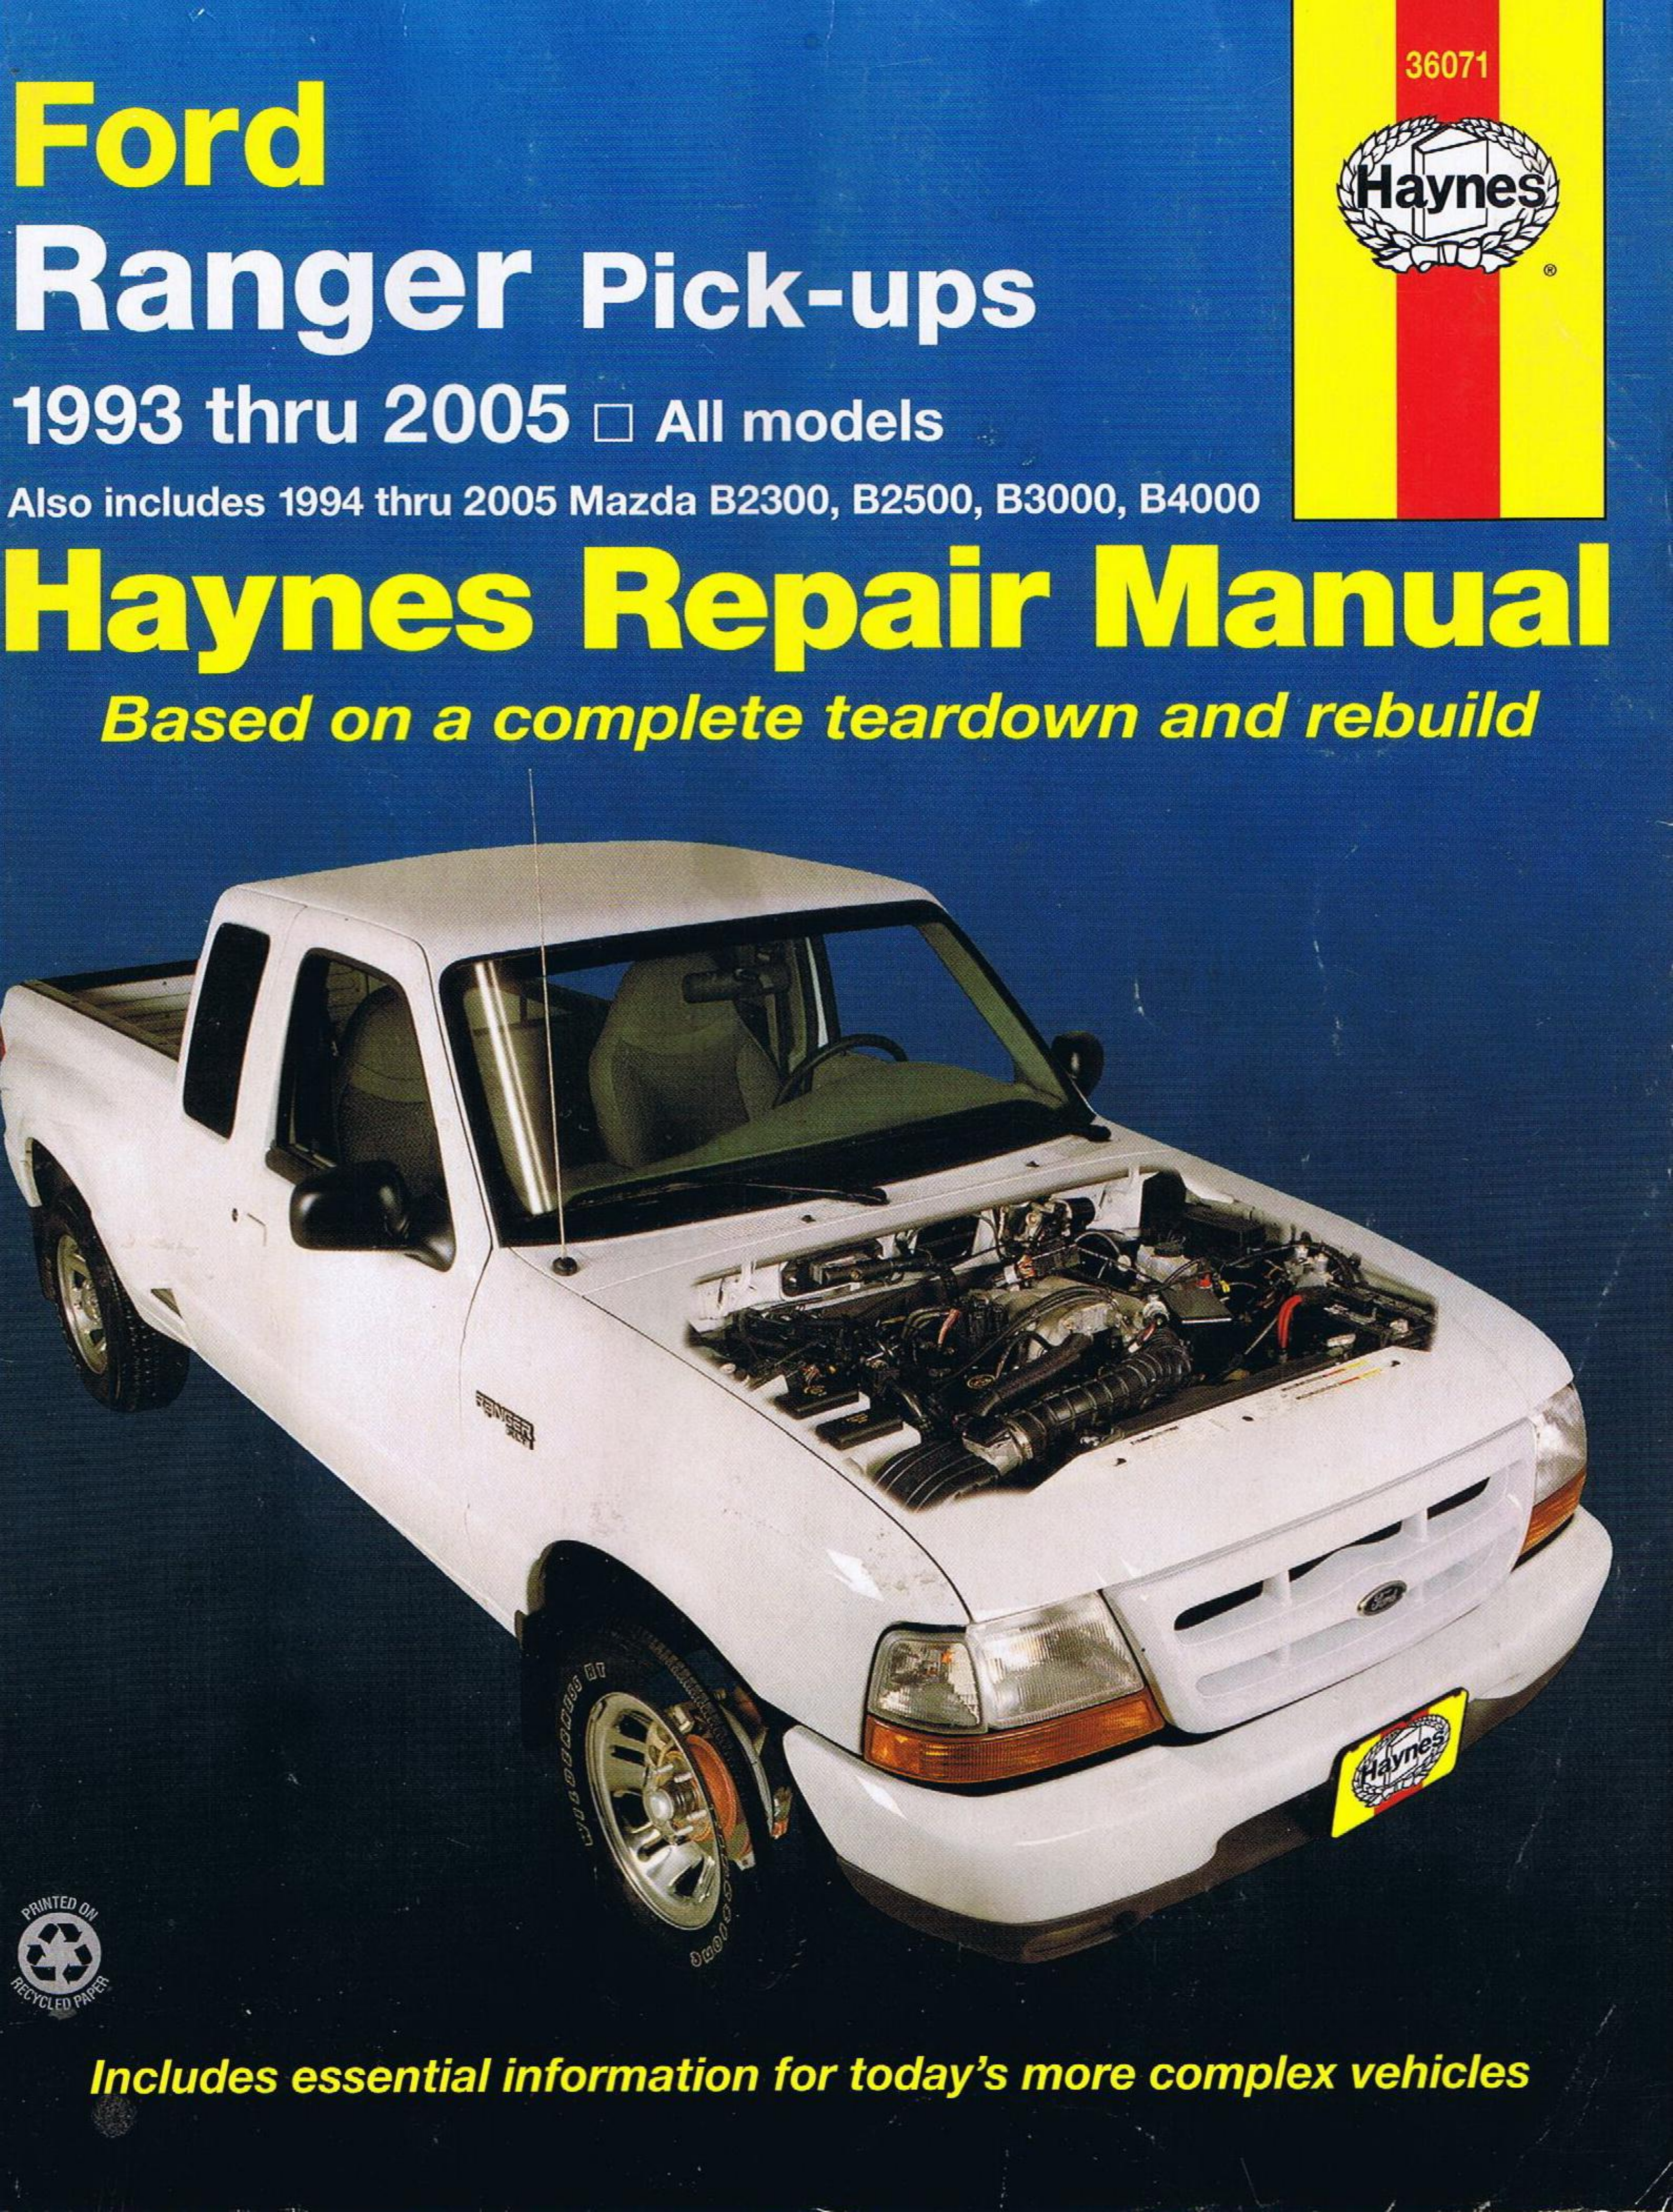 Ford Ranger 1993 2005 Service Manual PDF